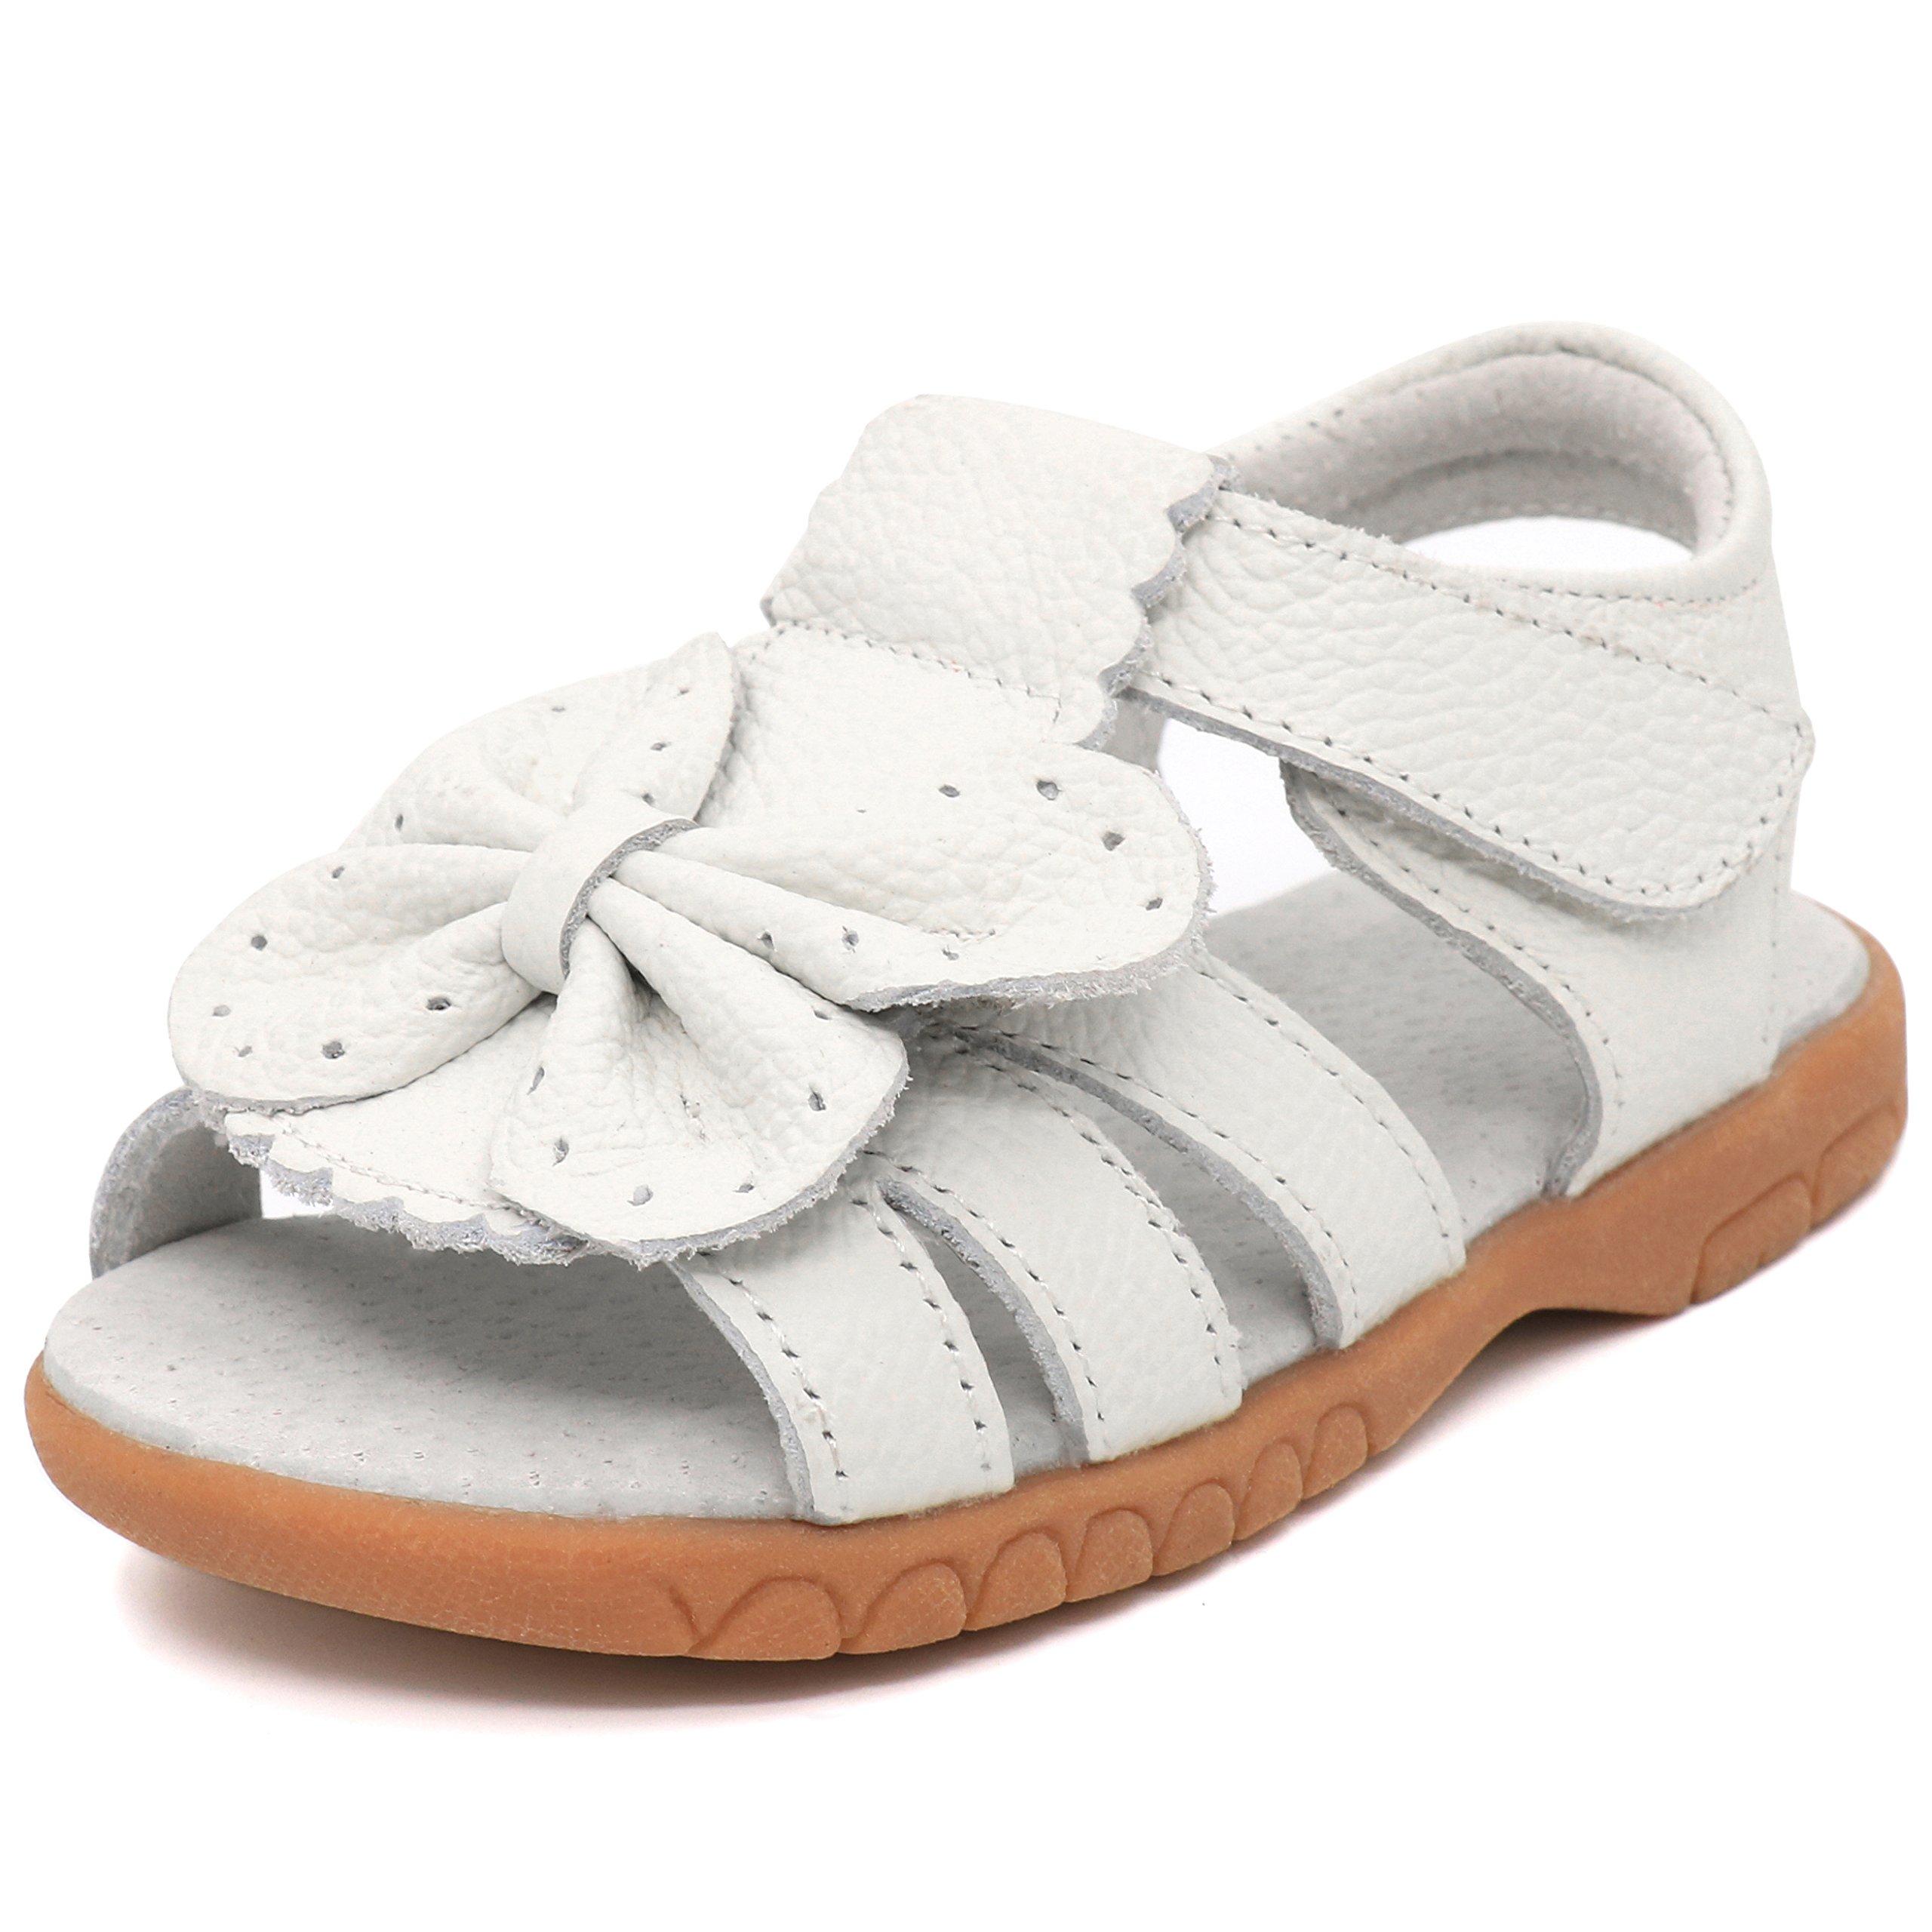 Femizee Toddler Girls Leather Summer Flower Sandals,Whtie Butterfly,1537 CN26